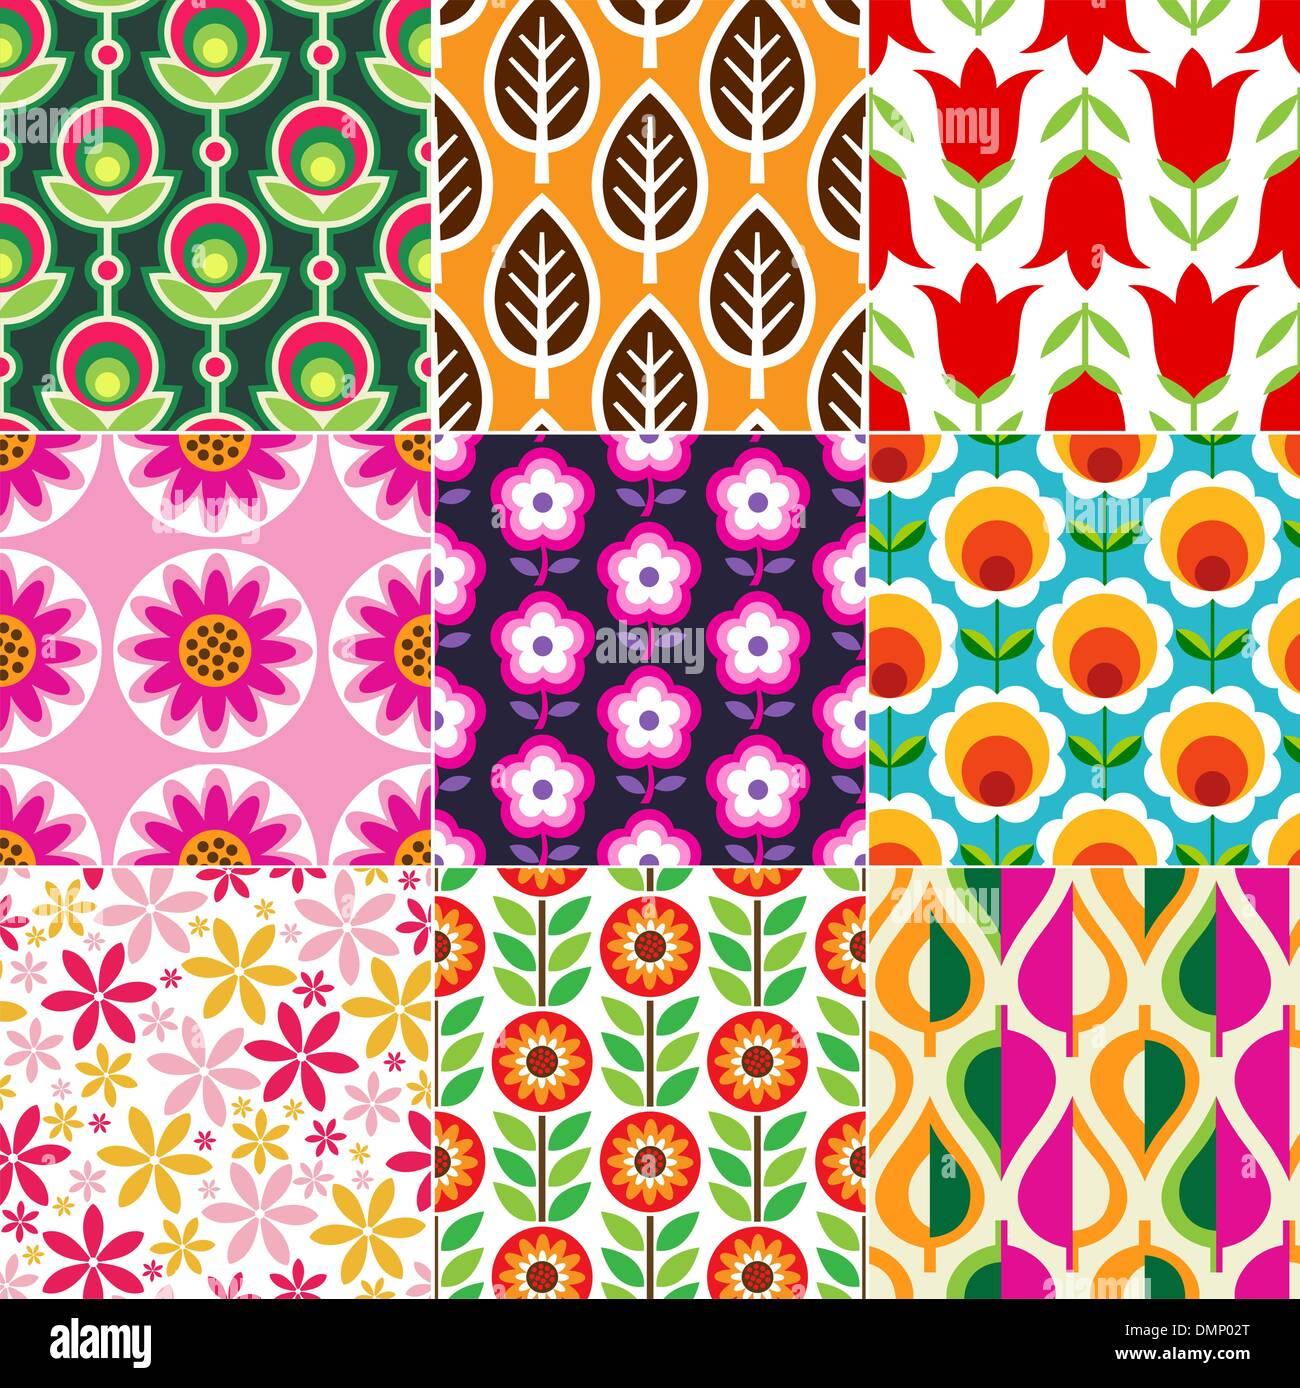 seamless retro flower pattern - Stock Image